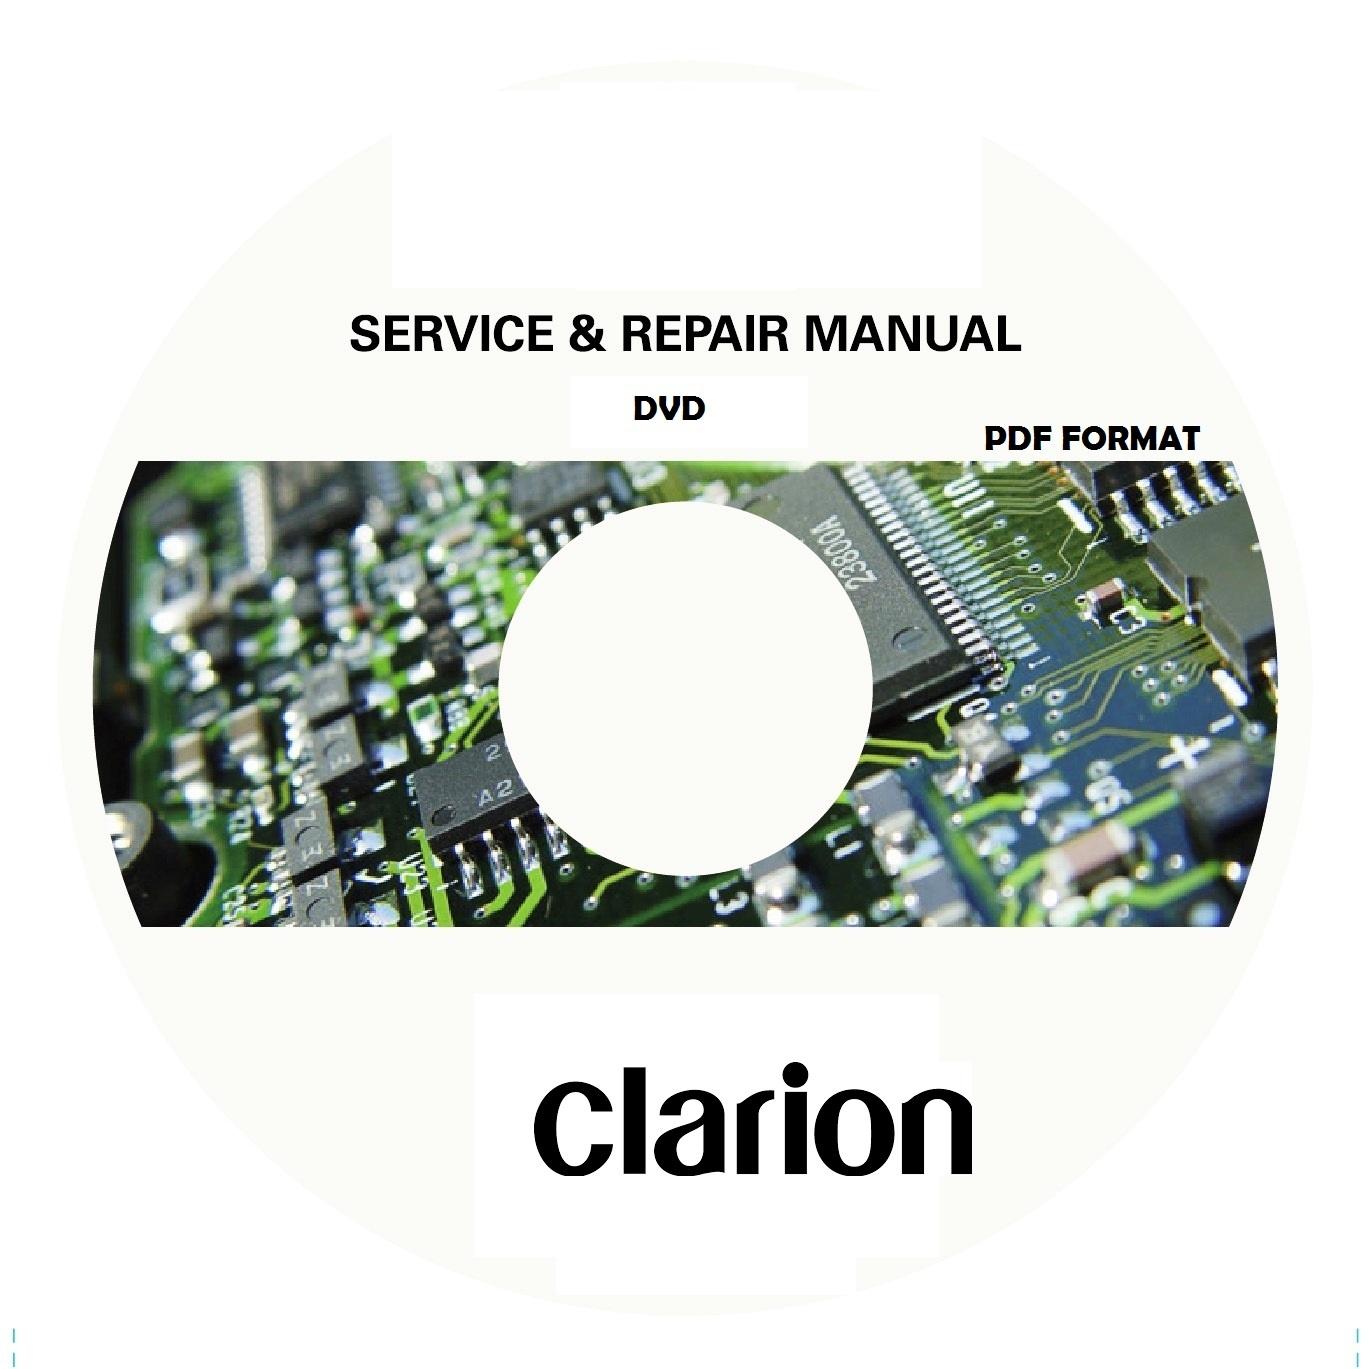 Xdz716 Clarion Wiring Diagram Radio Harness Dvd With Service Manual Pdf Format Rh Sellfy Com Marine